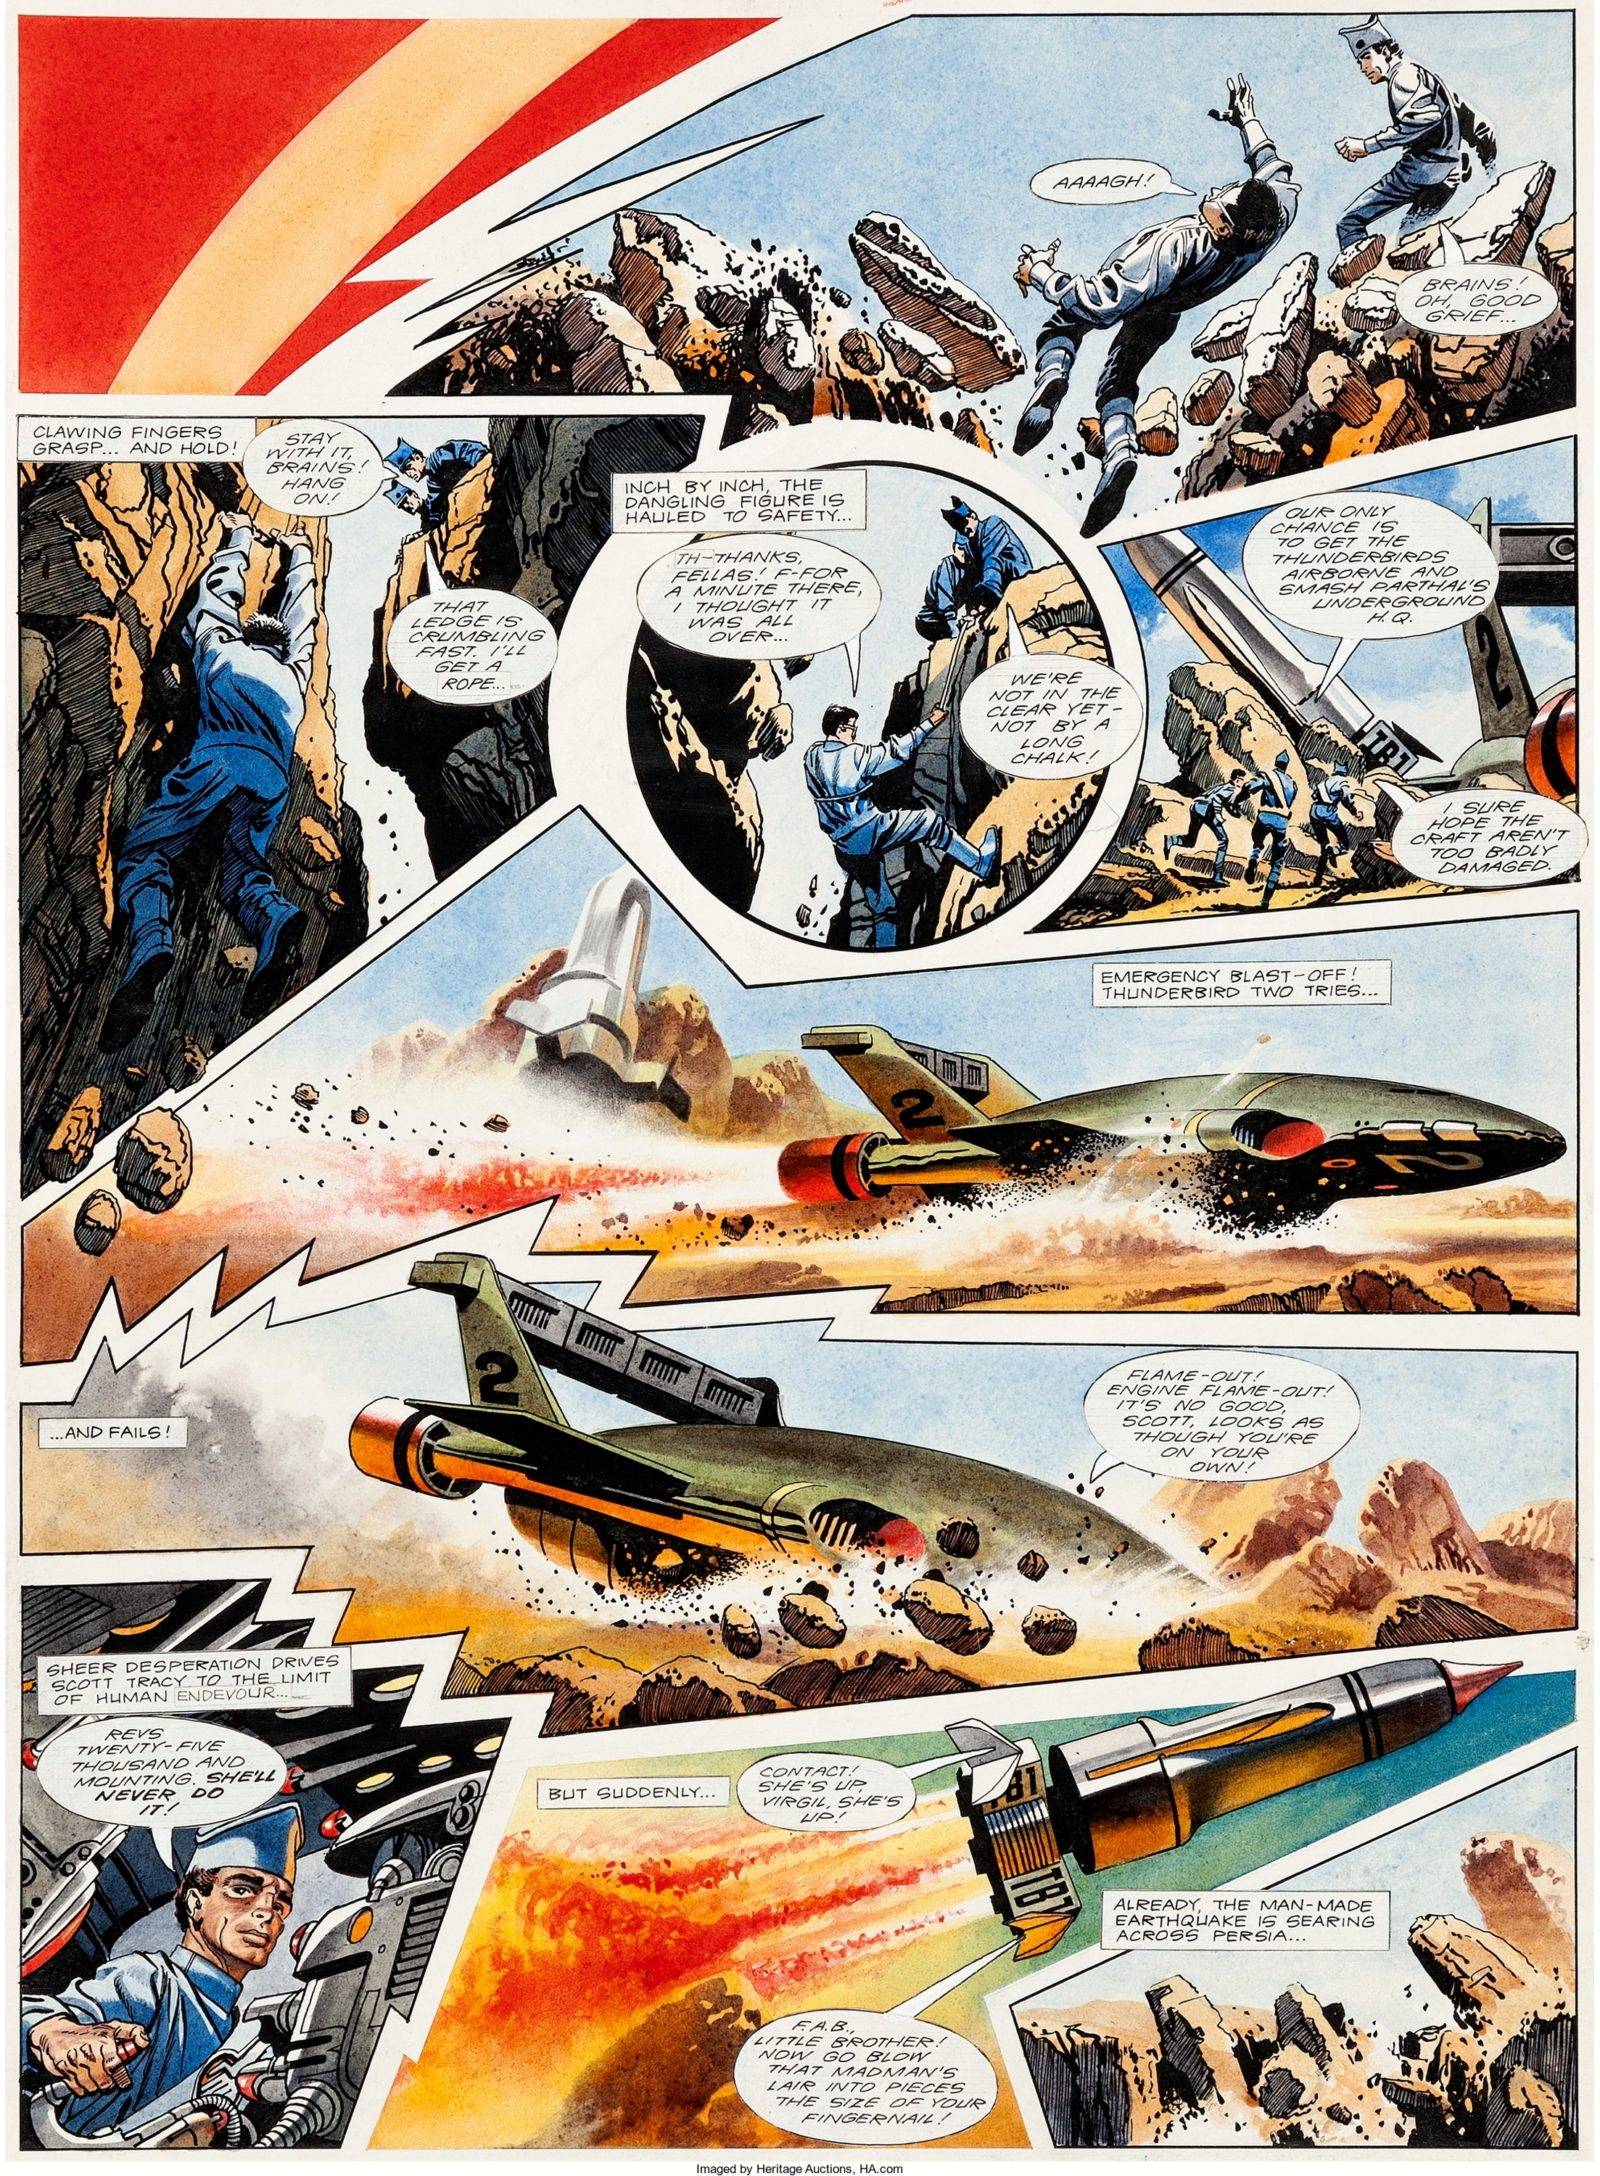 TV21 146 - Thunderbirds by Frank Bellamy (Trimmed)